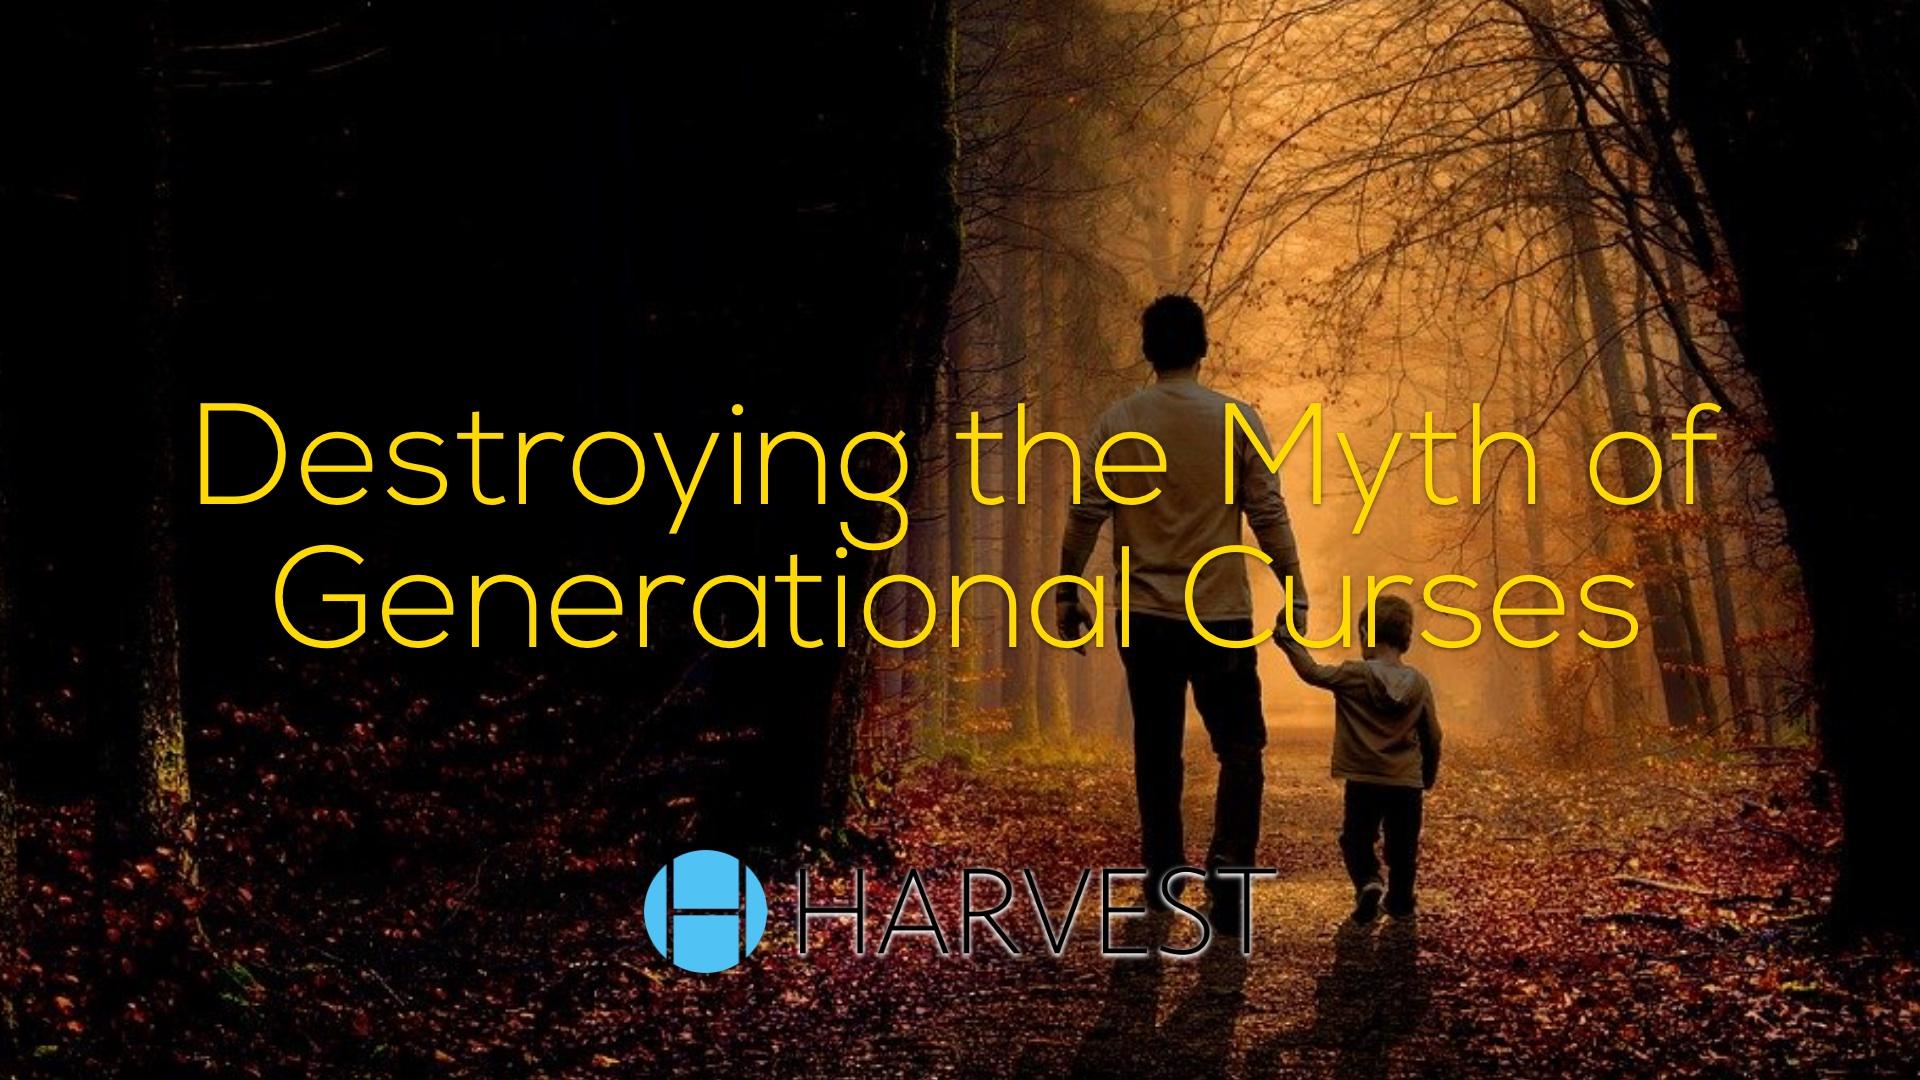 Destroying the Myth of Generational Curses